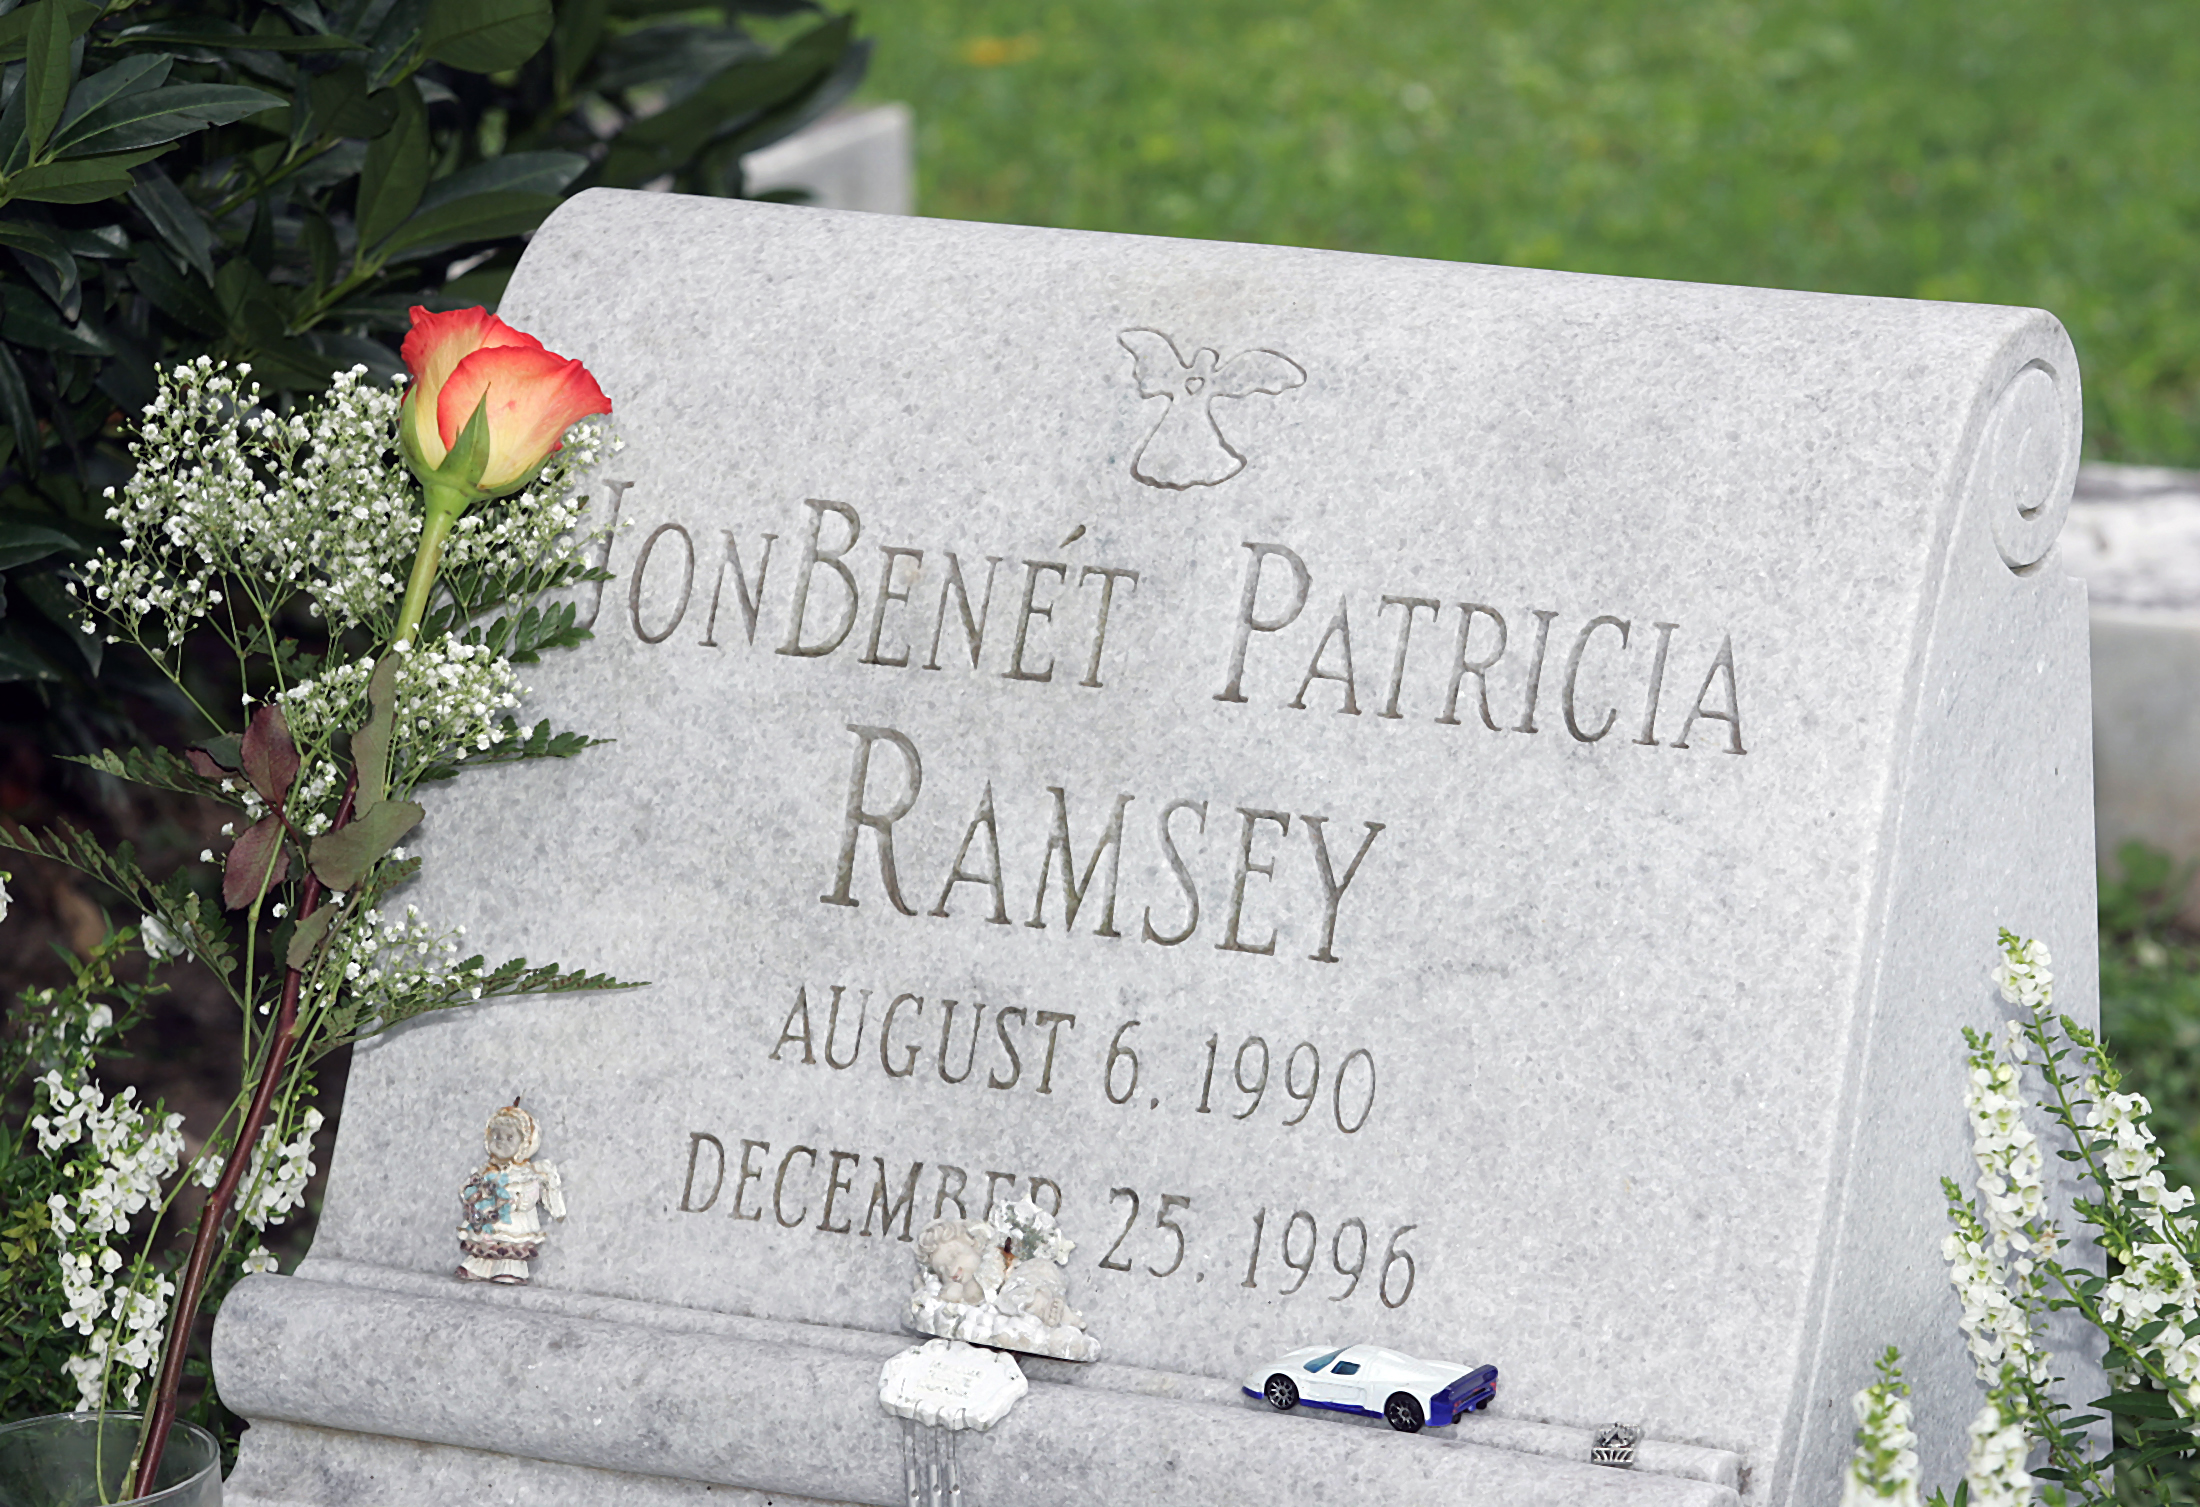 RAMSEY ARREST